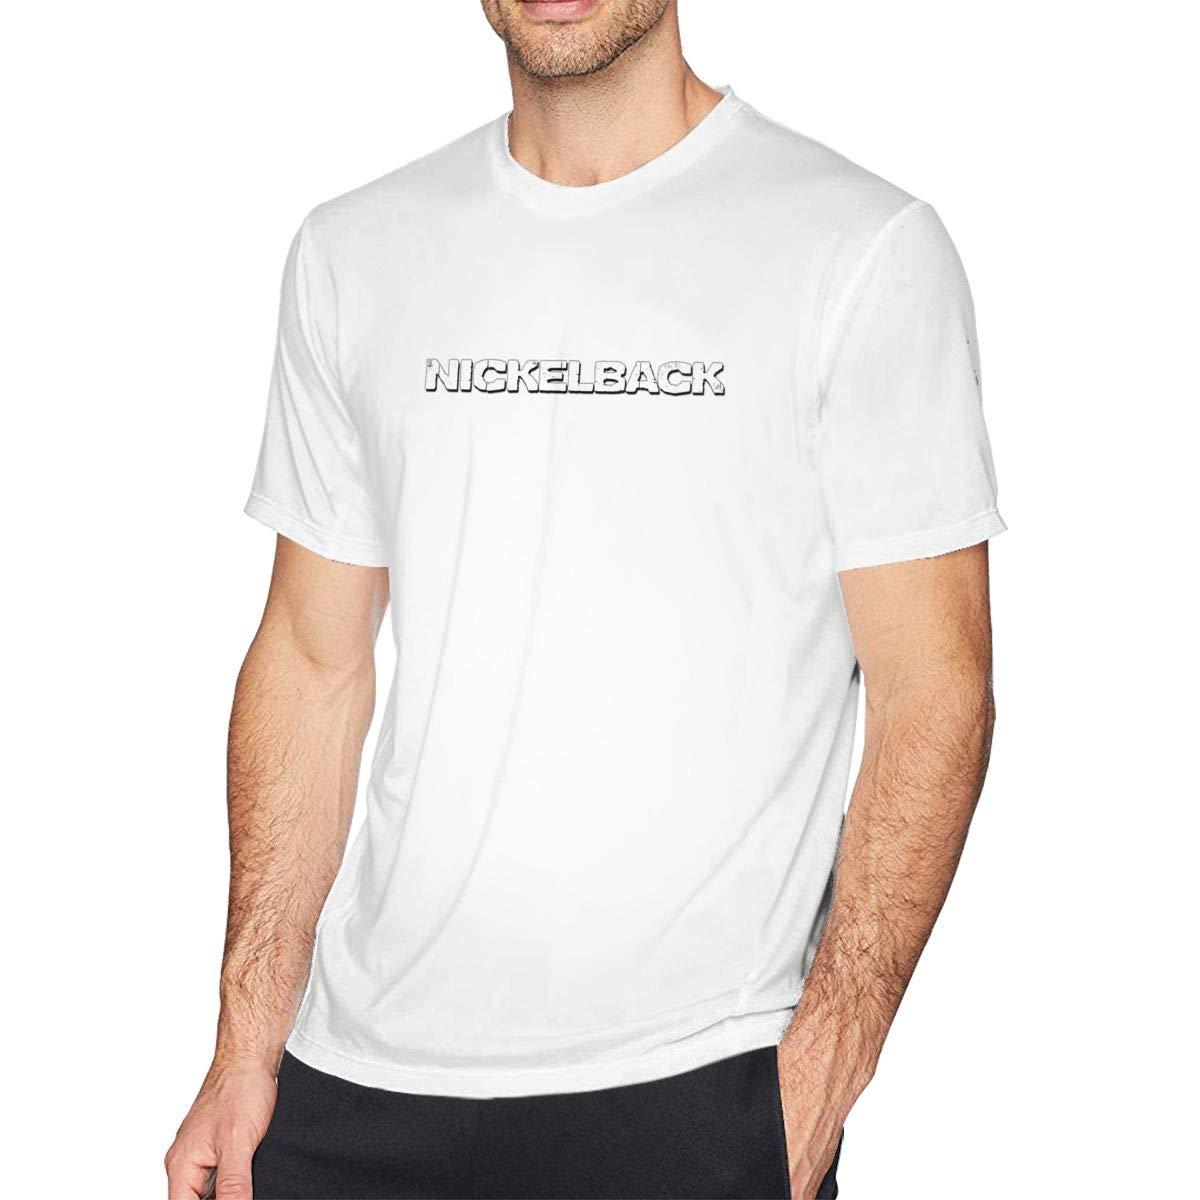 David Wollaston Nickelback S T Shirt